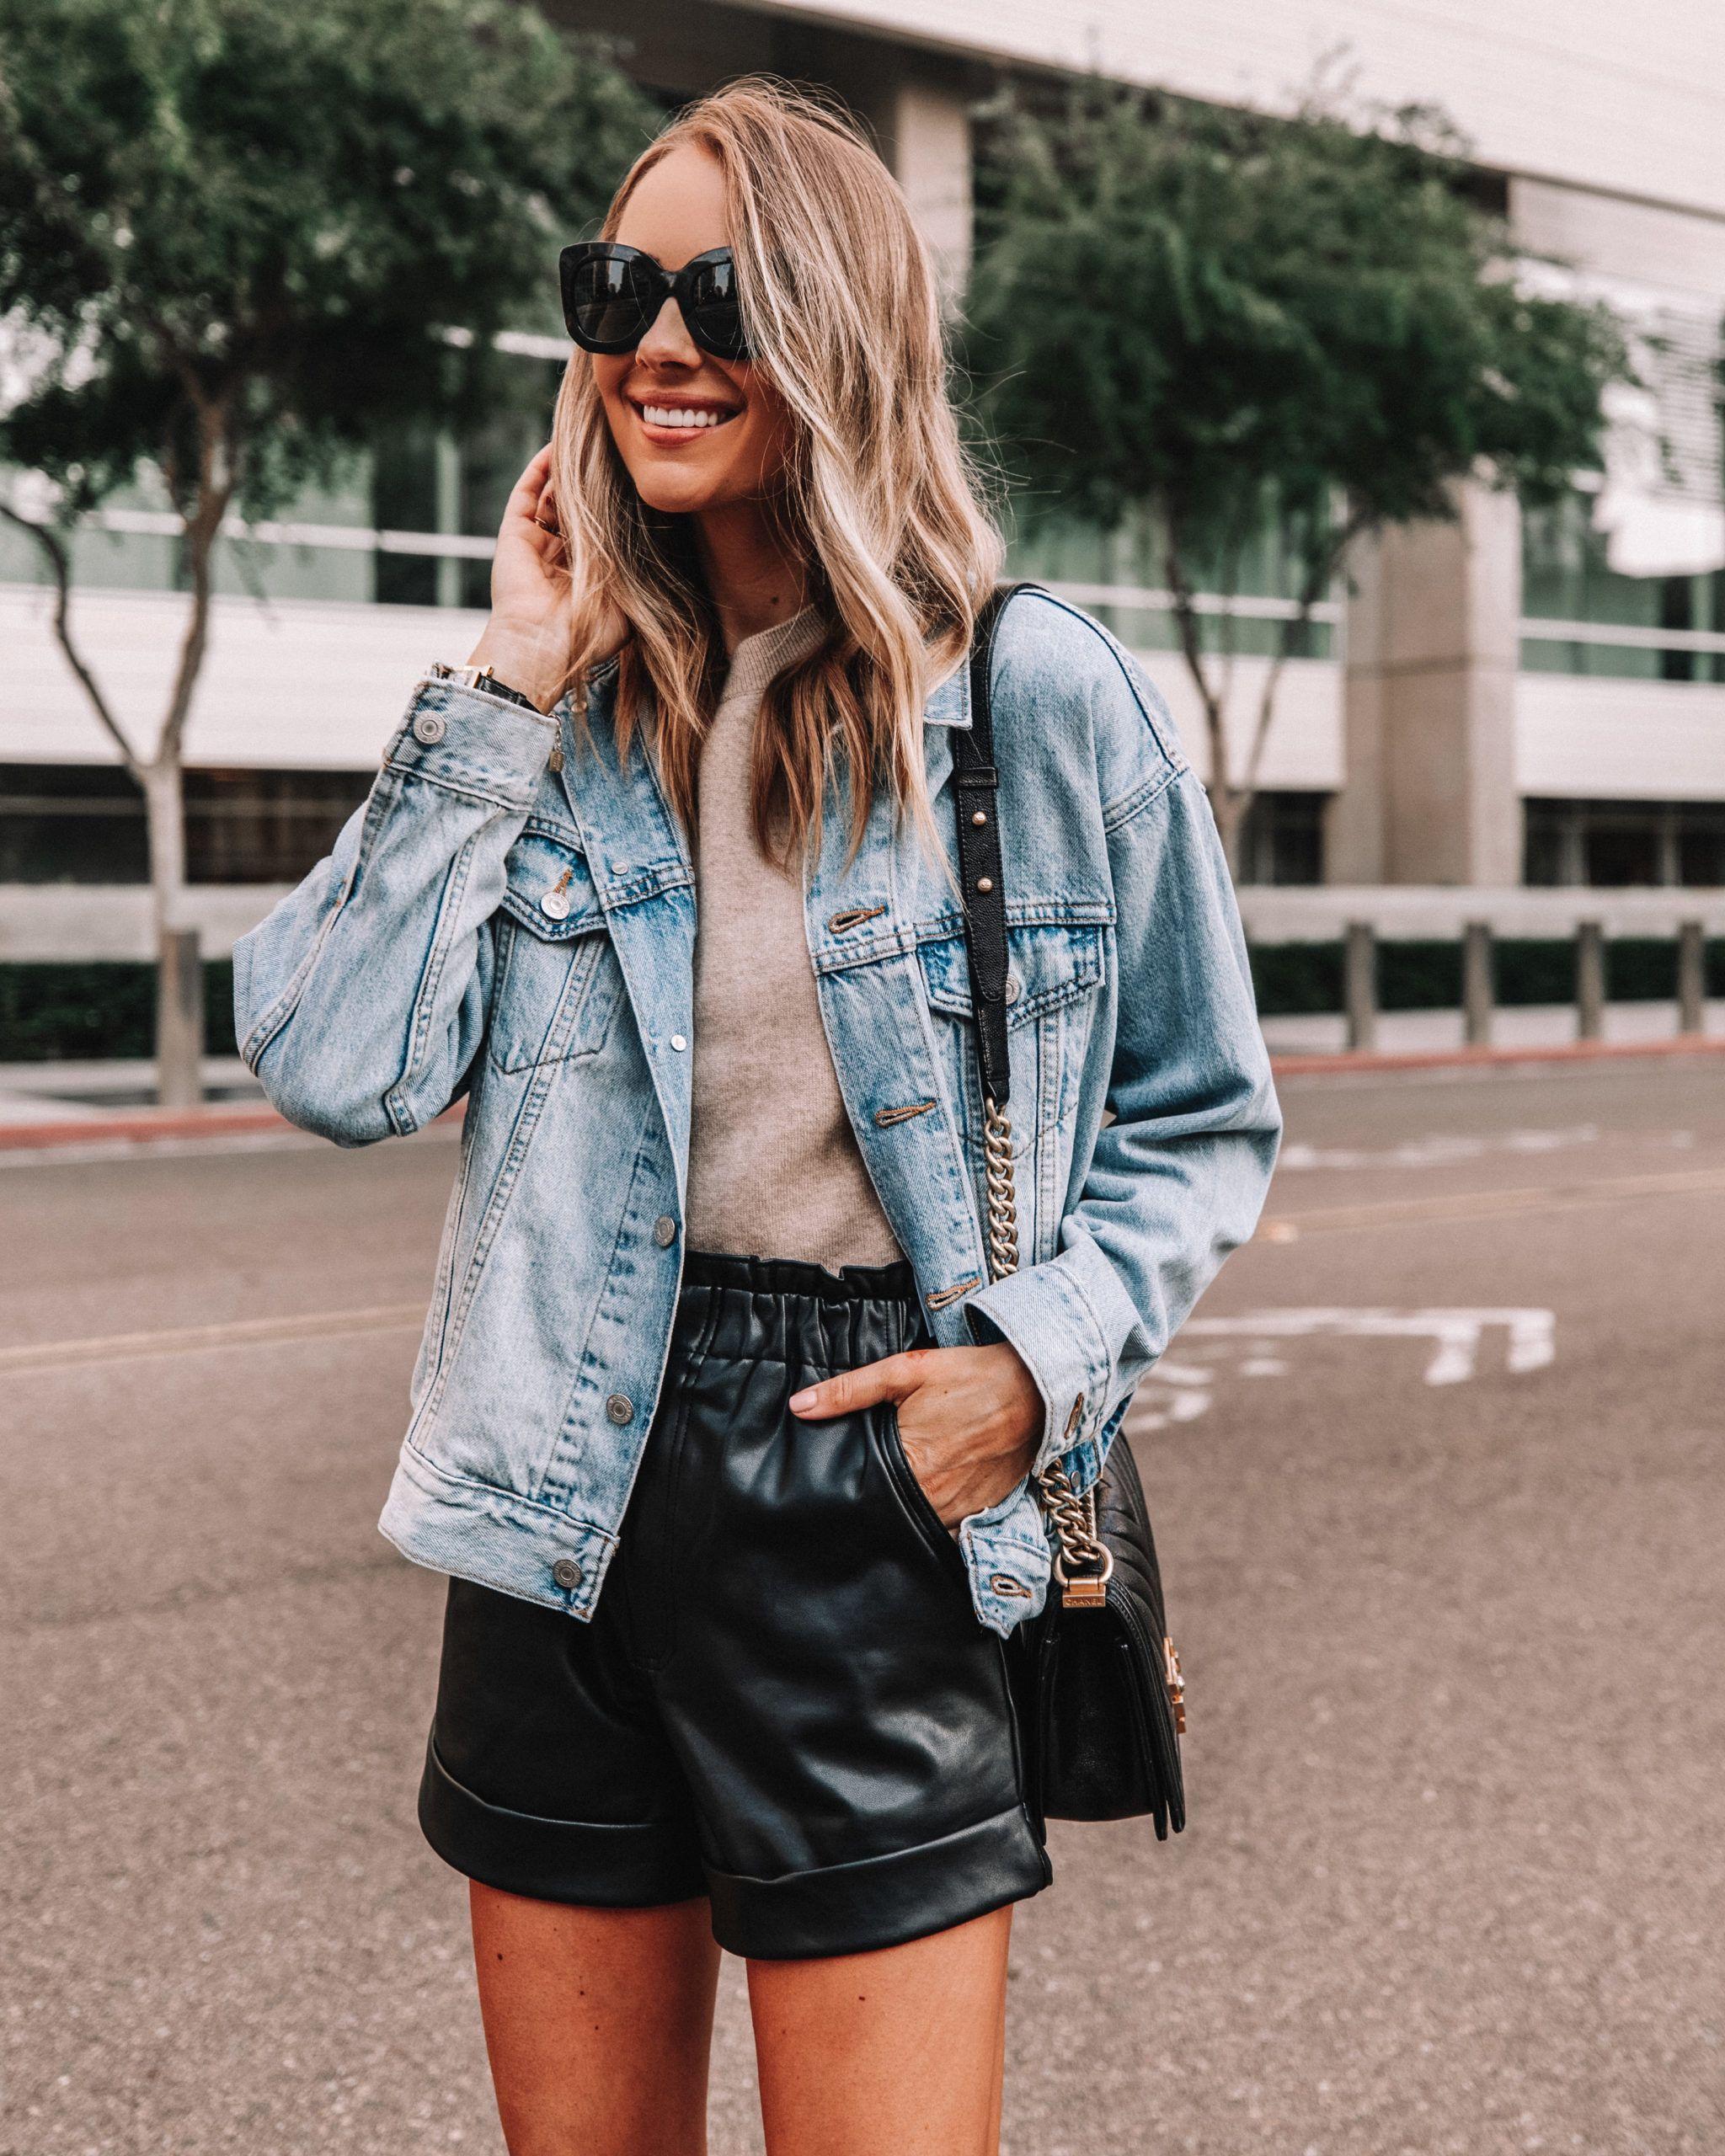 Fashion Jackson Wearing Levis Oversized Denim Jacket Faux Leather Shorts Fall Outfit Leather Shorts Outfit Fashion Jackson Leather Shorts [ 2560 x 2048 Pixel ]